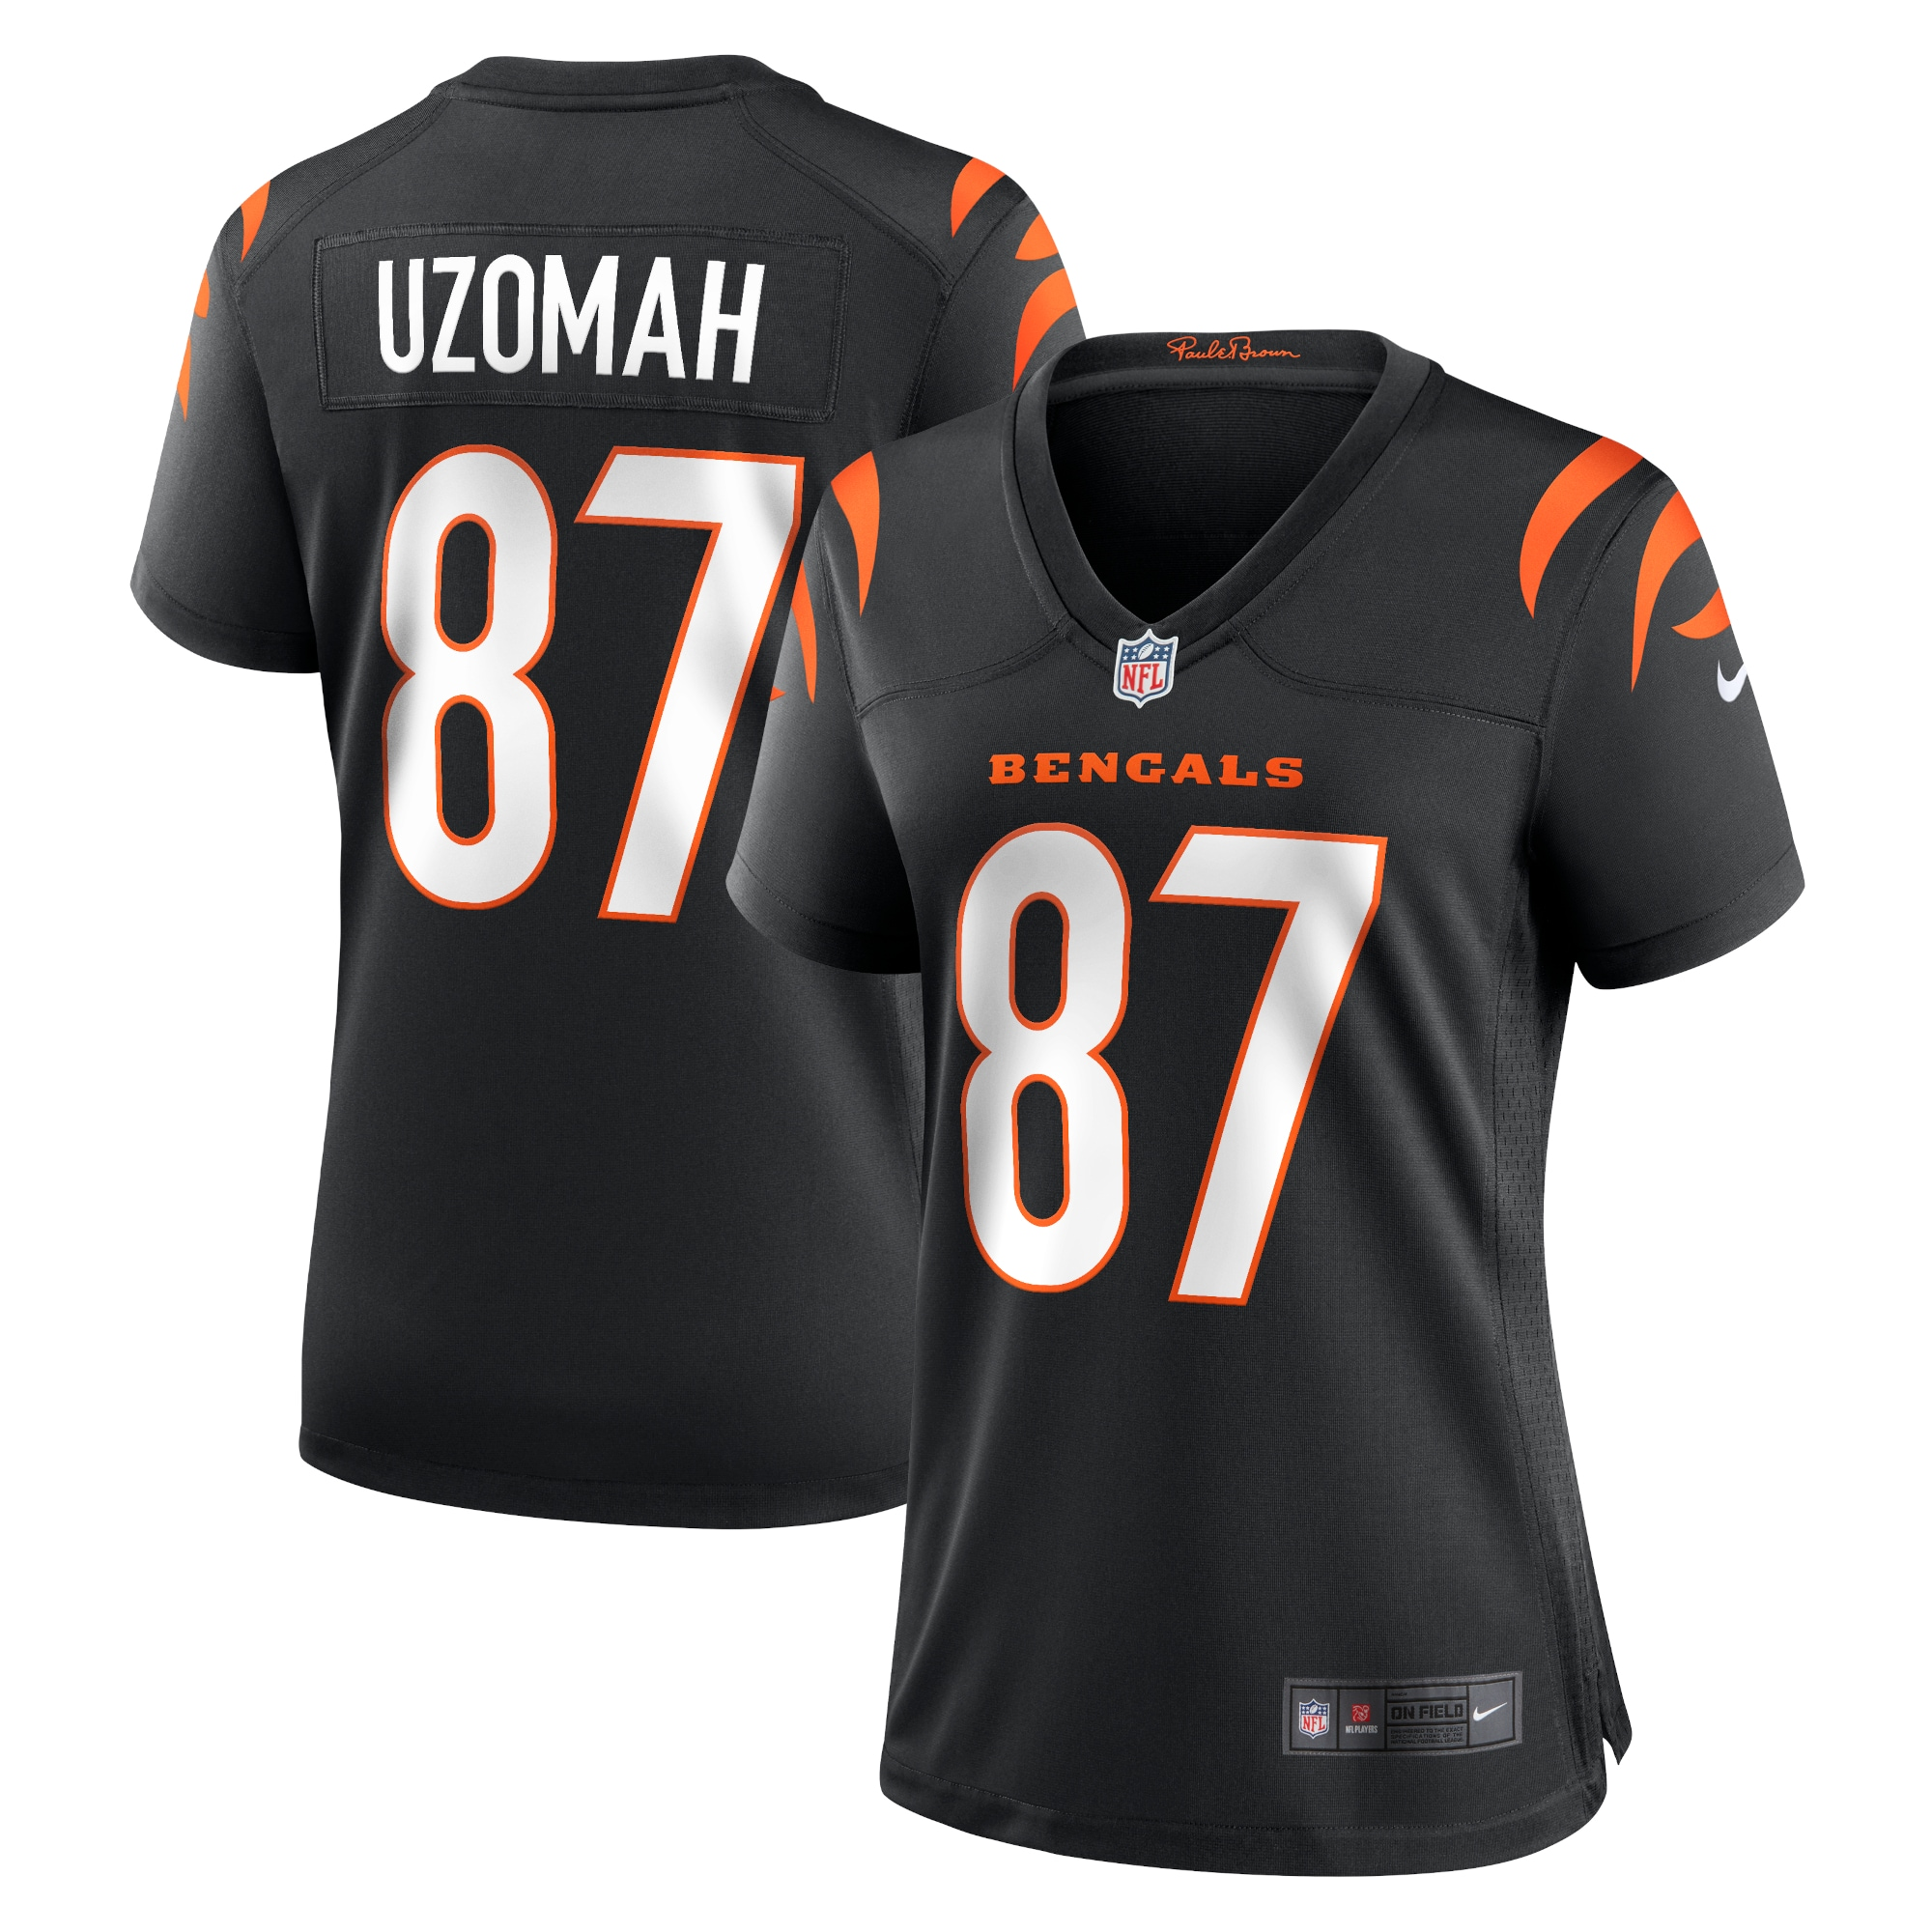 C.J. Uzomah Cincinnati Bengals Women's Nike Game Jersey - Black - Walmart.com